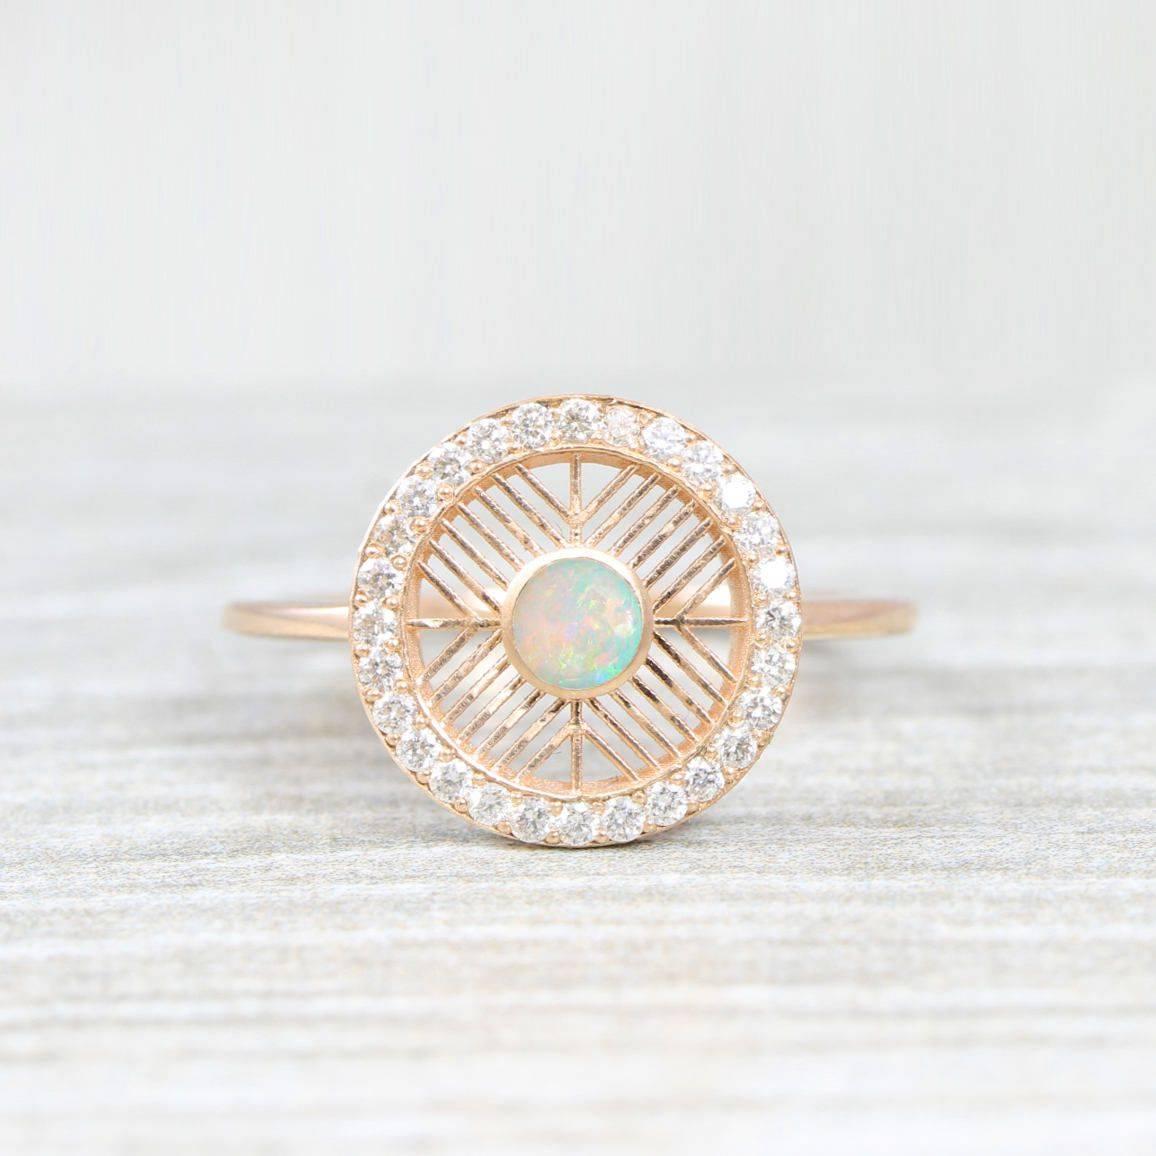 Art deco engagement ring-471118811020017604